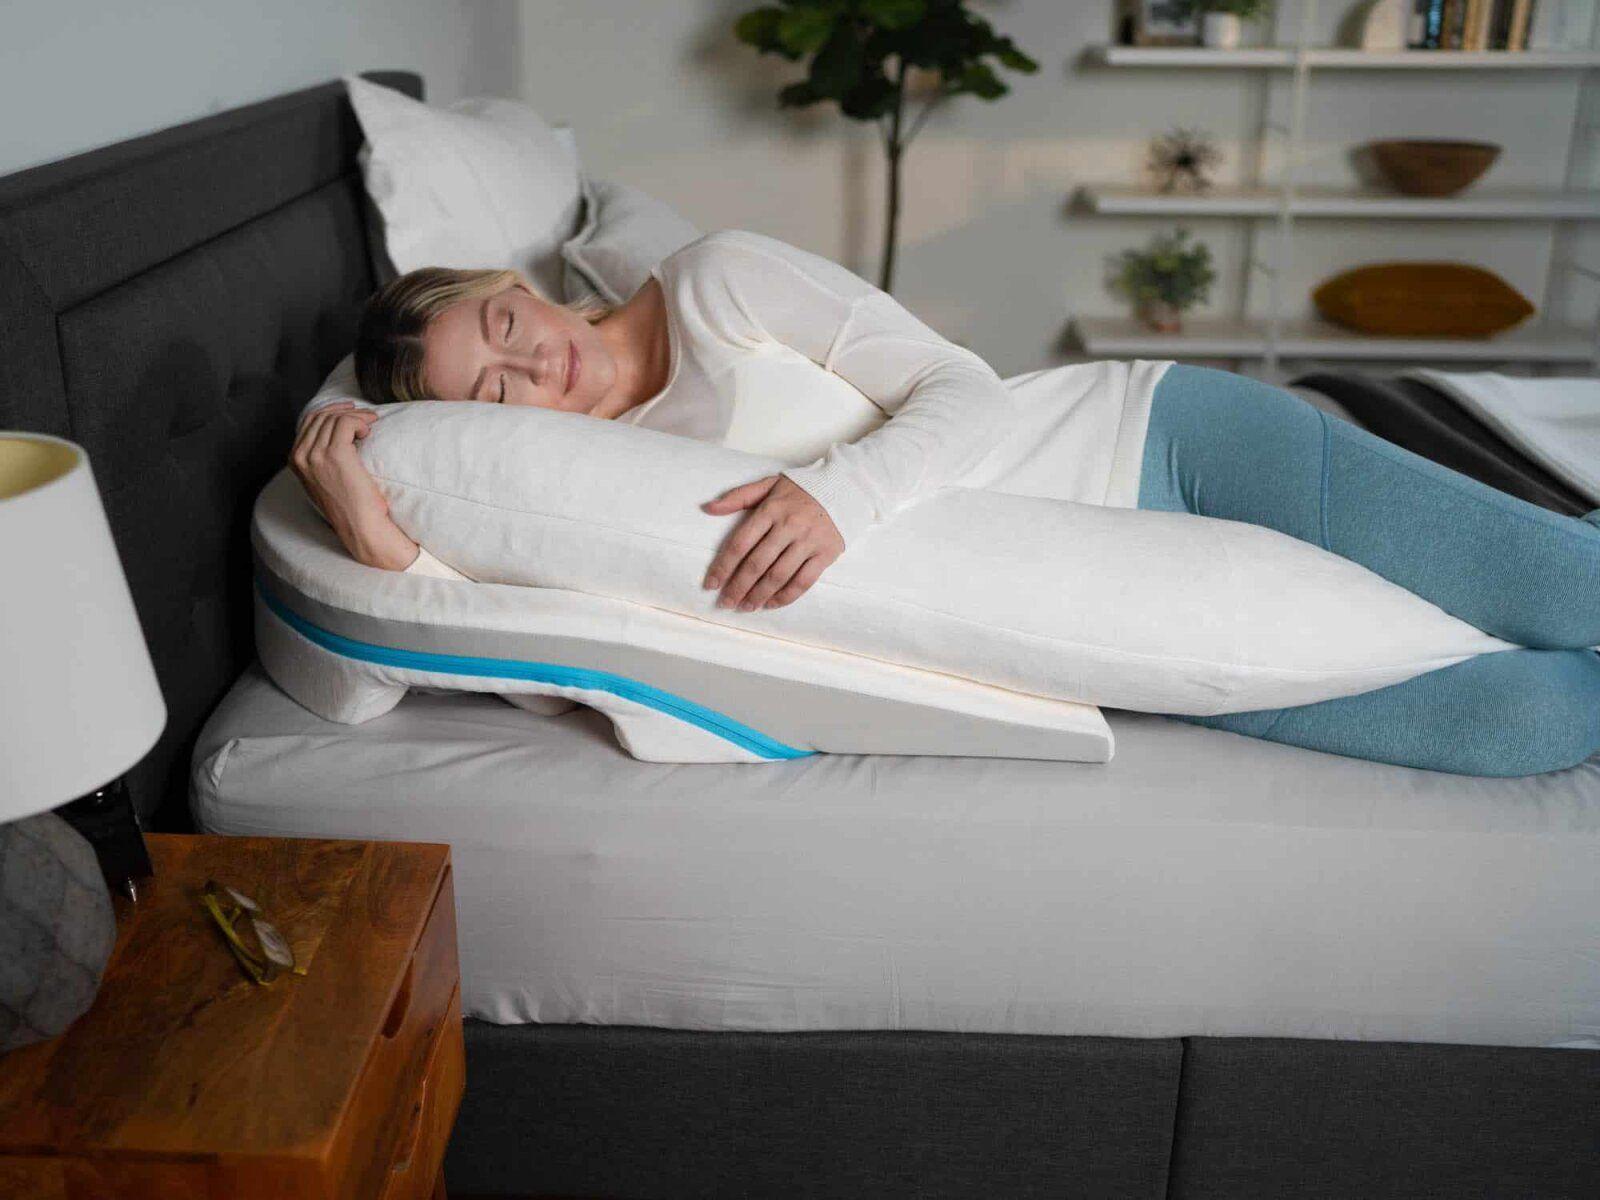 pillow between legs for sleeping